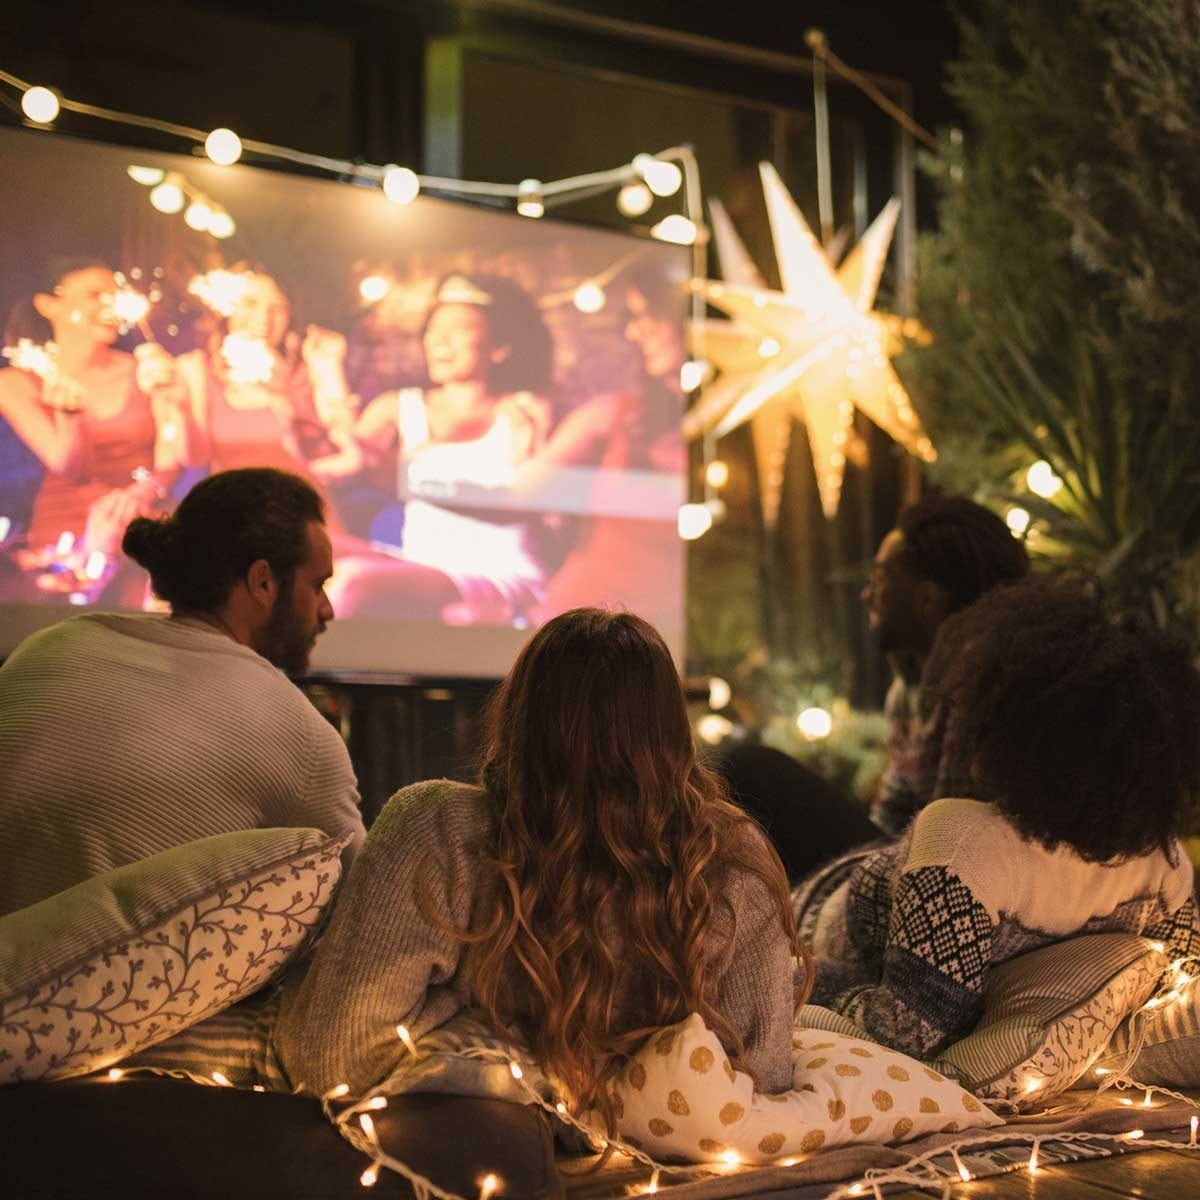 The Best Outdoor Projectors, Including Amazon's Top Seller